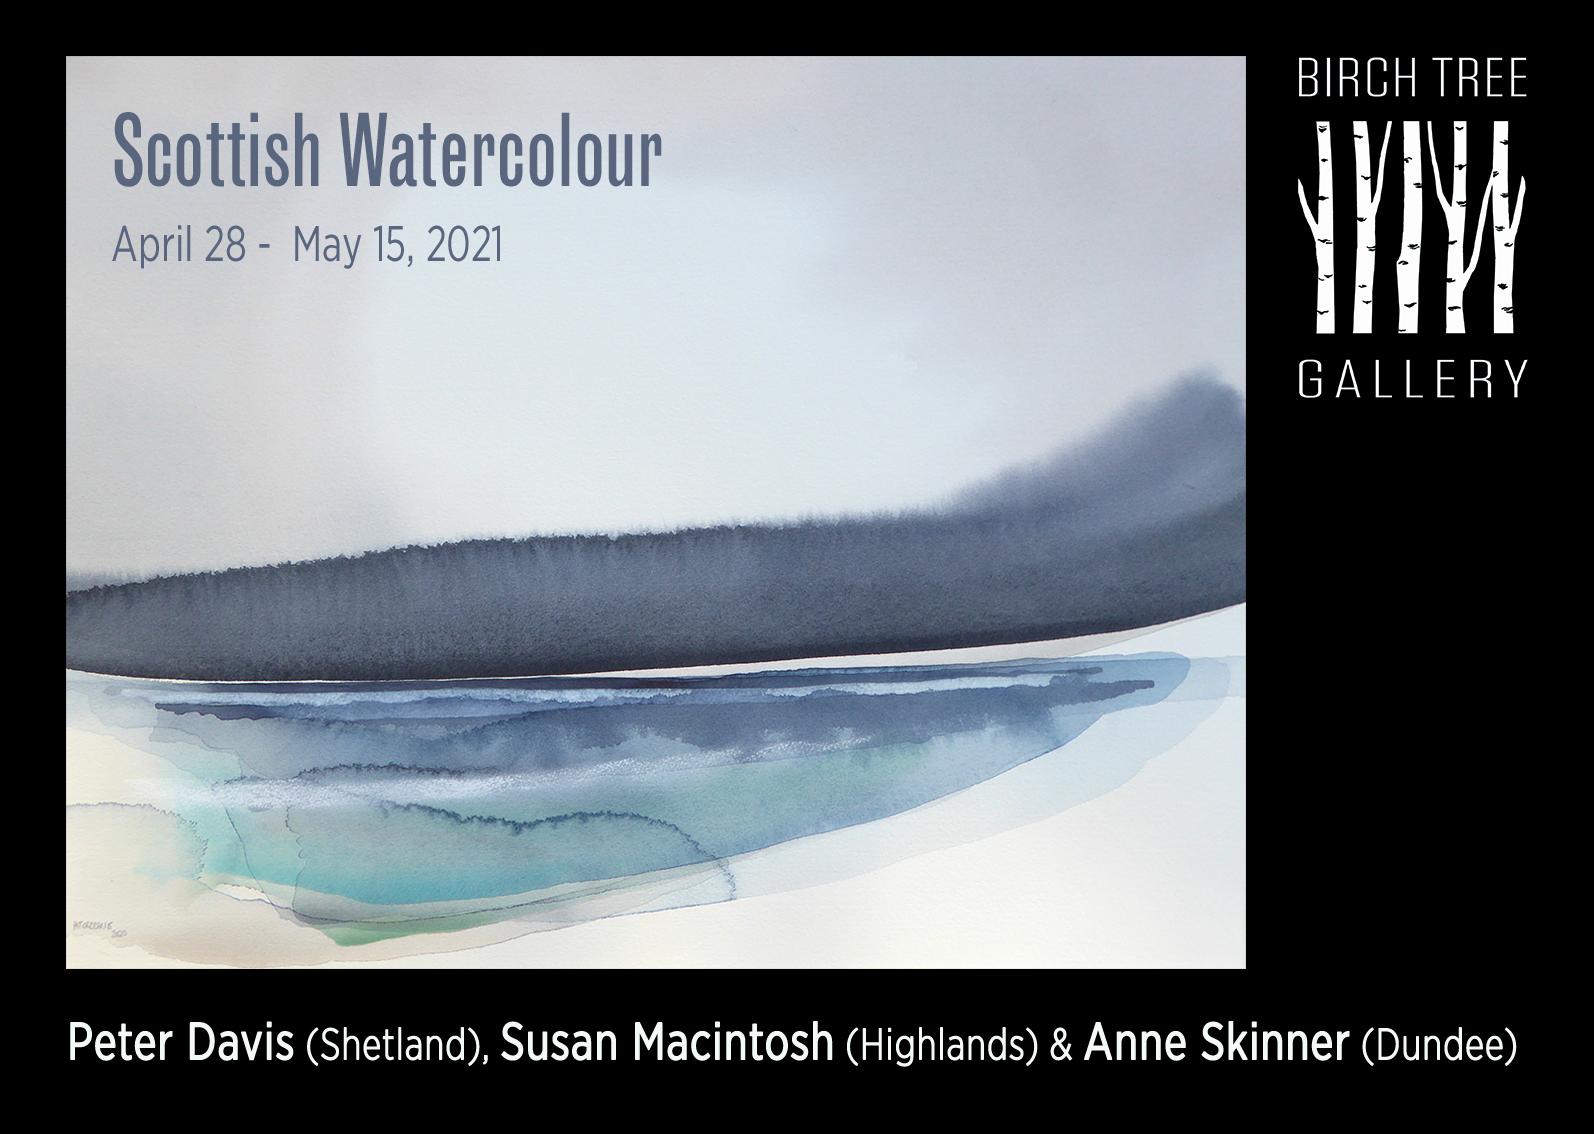 Birch Tree Gallery - Scottish Watercolour